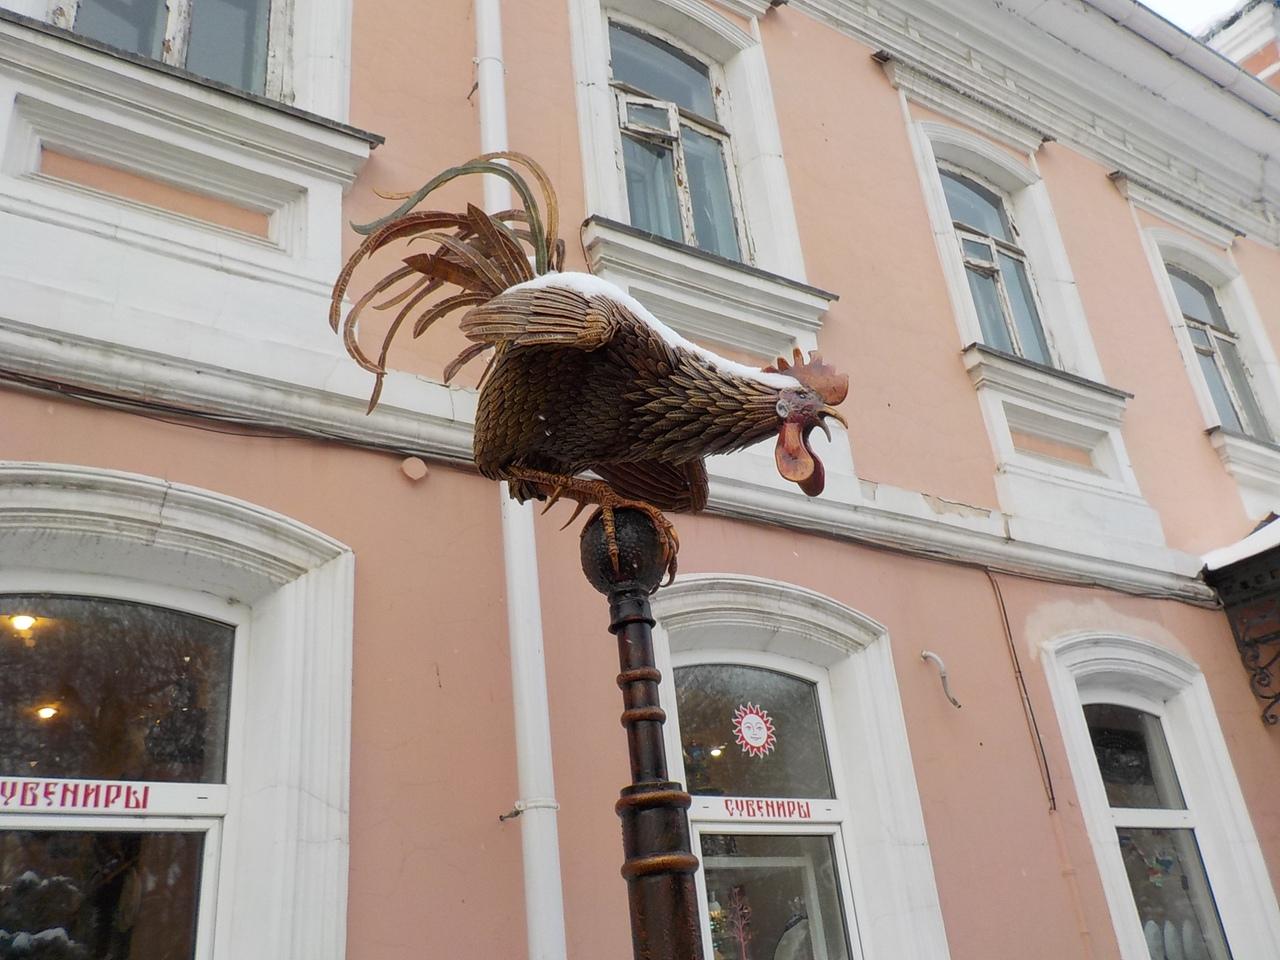 В музей Рязанского леденца. Подождите загрузки картинки!